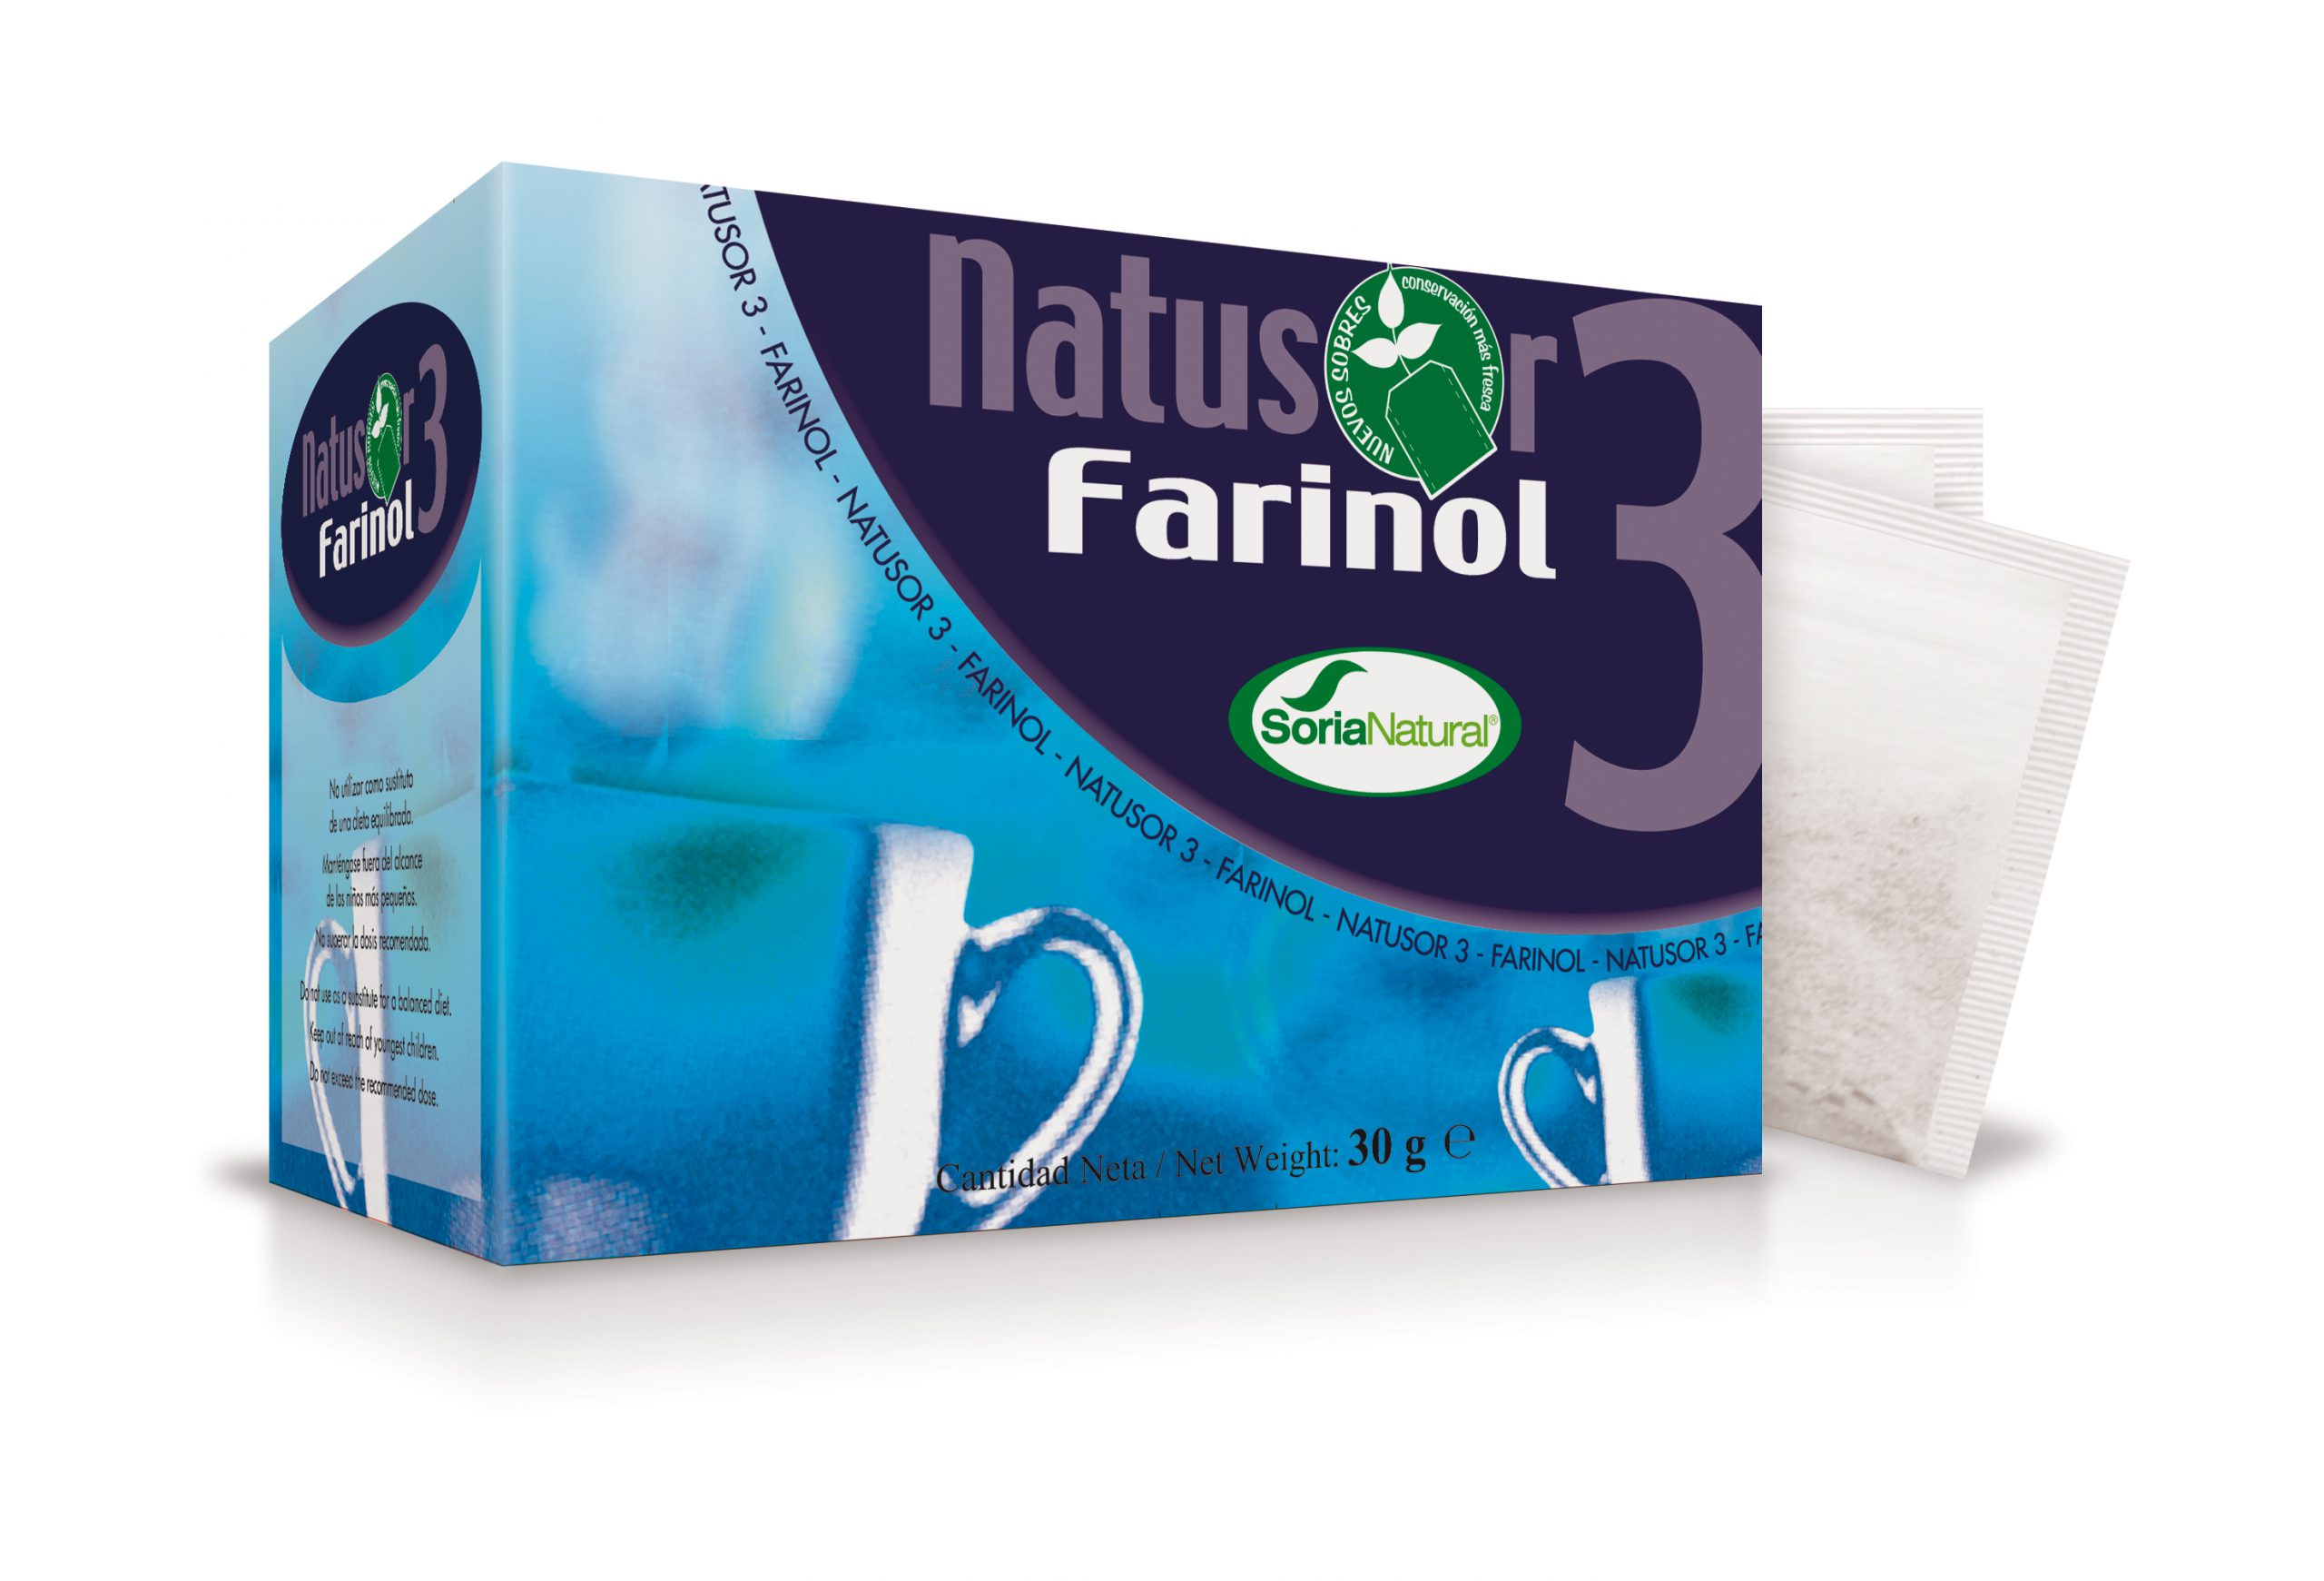 Natursor 03 Farinol